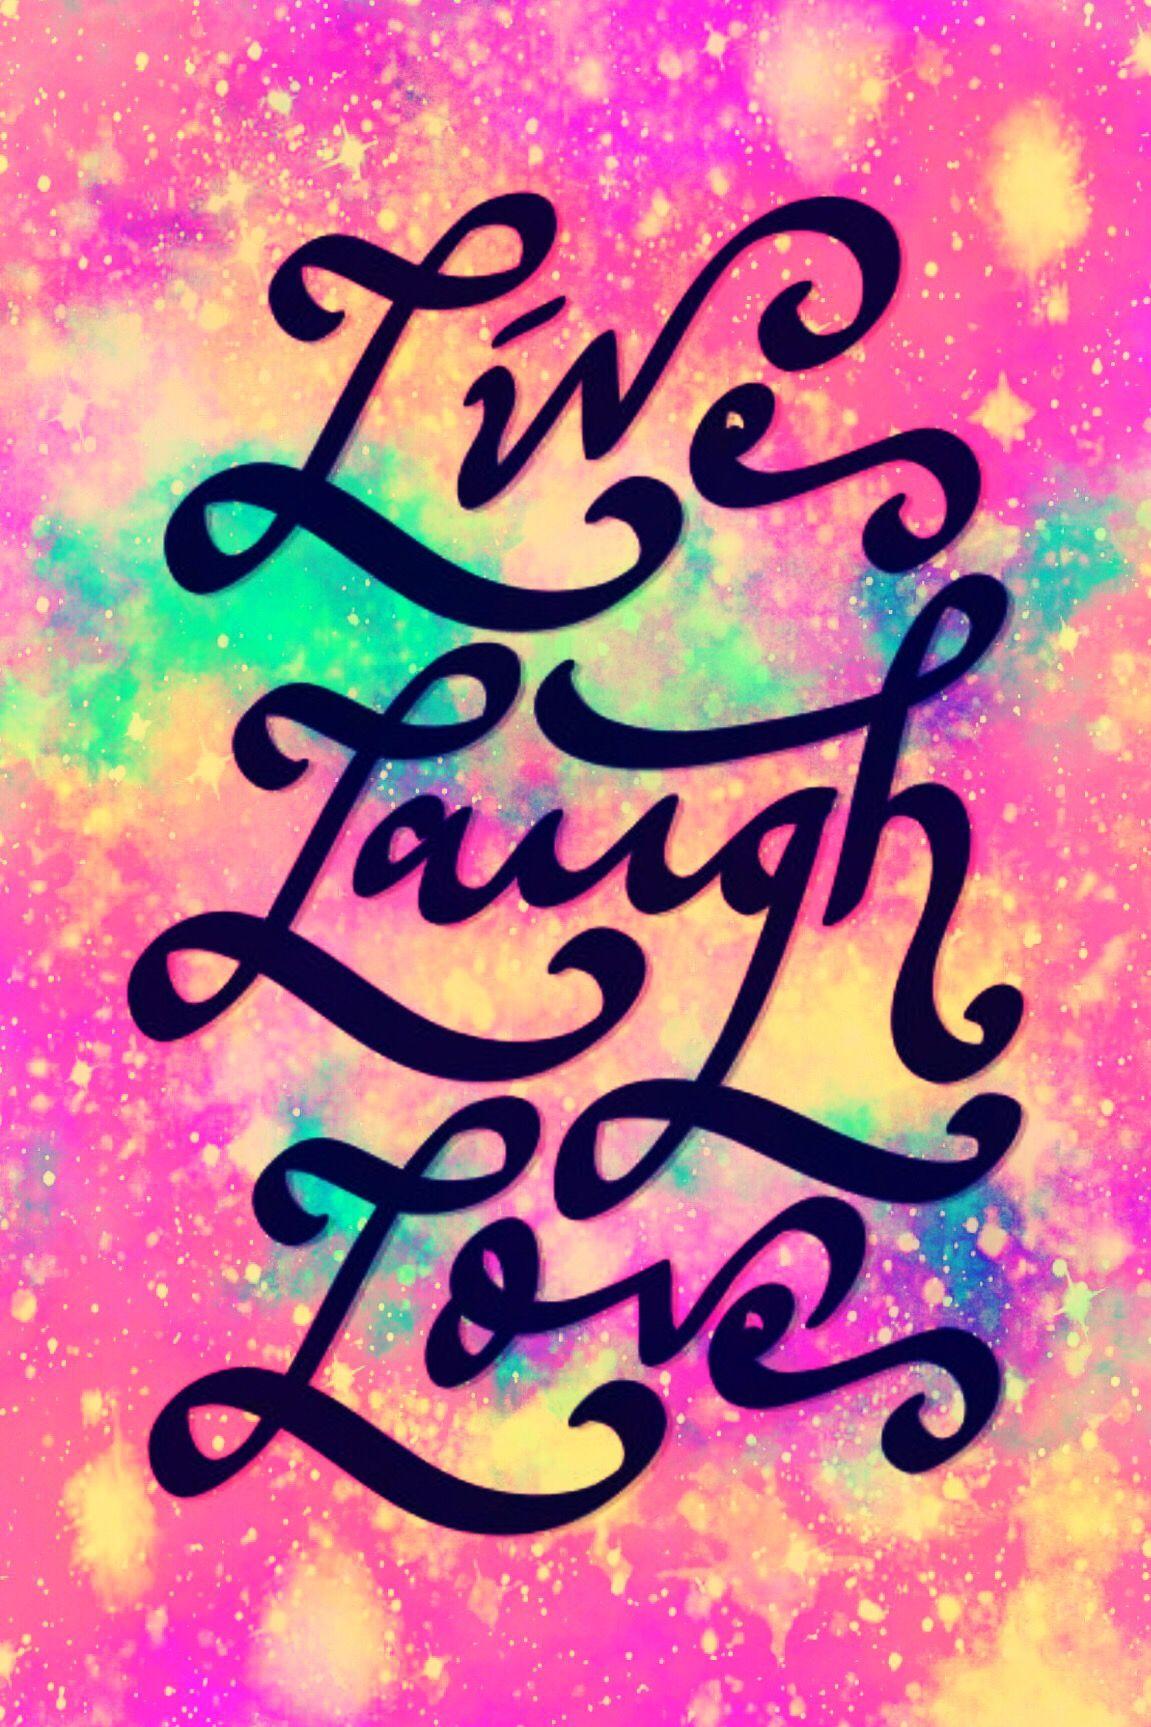 Wallpaper Lockscreen Quotes Sayings Laugh Love Live Motivation Positivity Glitter Sparkle Galaxy Pi Wallpaper Quotes Trendy Wallpaper Fb Wallpaper Galaxy live laugh love wallpaper